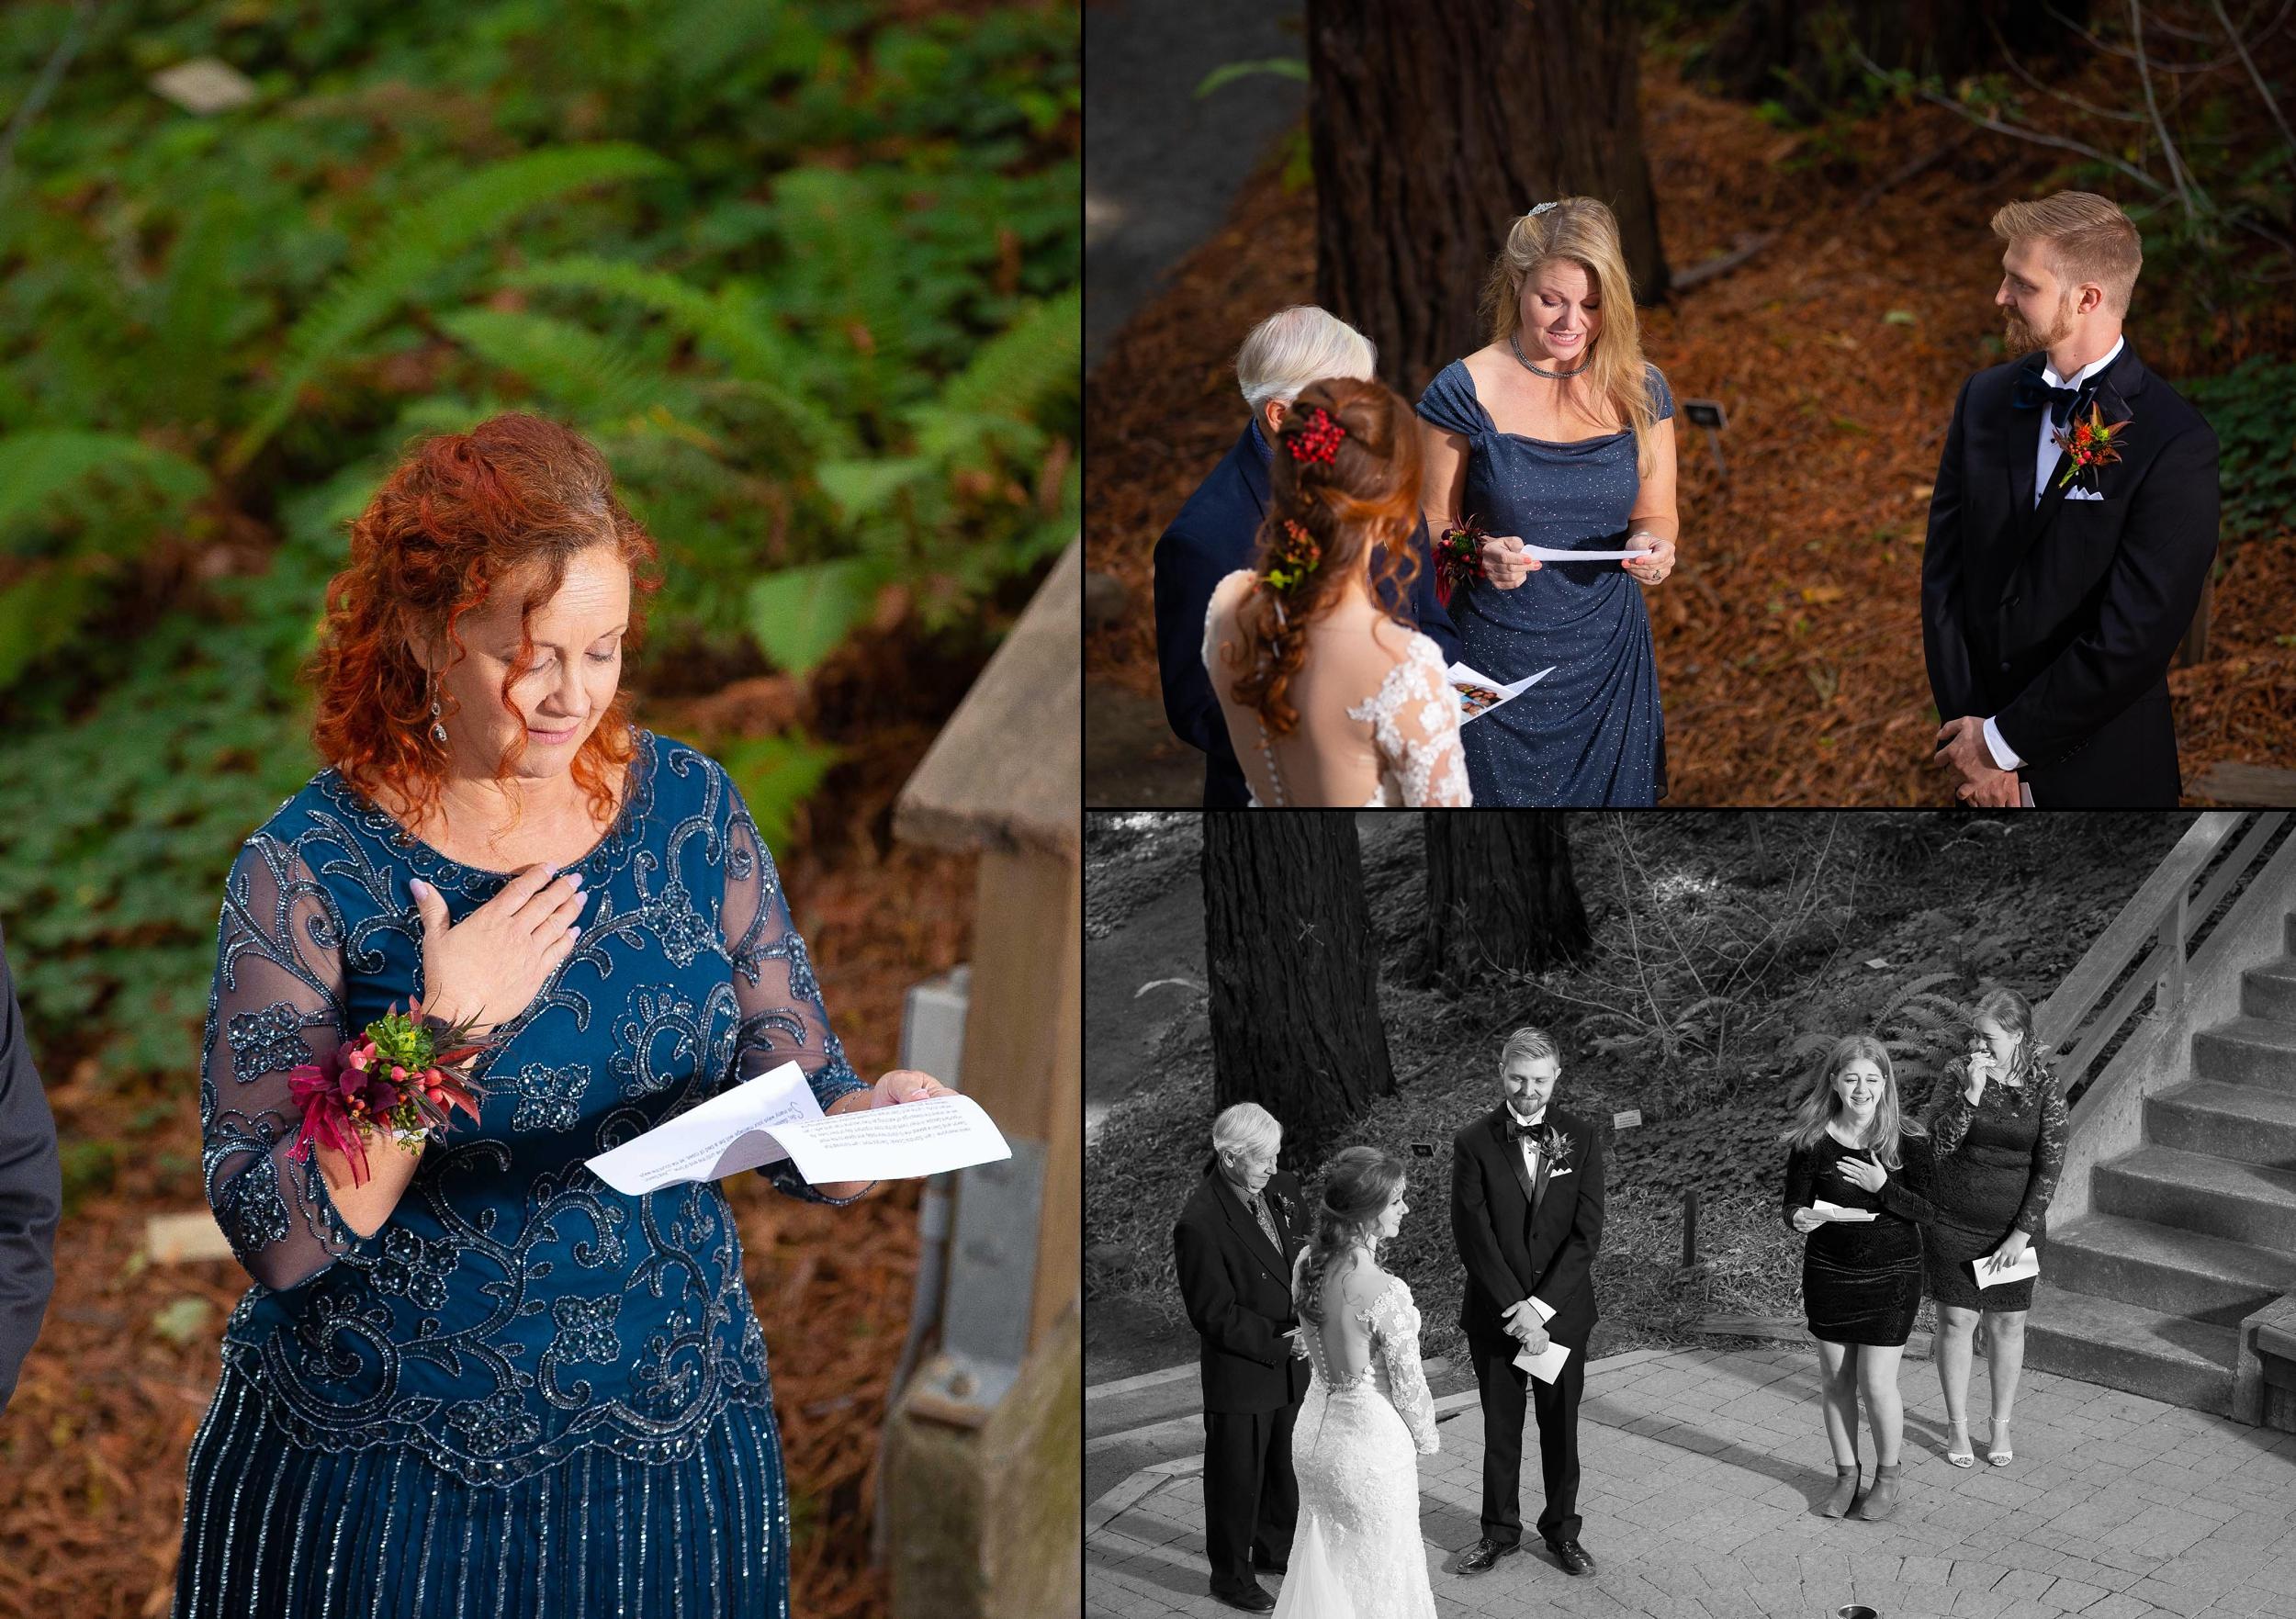 Berkeley Botanical Garden Wedding Ceremony in the Redwood Grove Ceremony and SF Bay Wedding Cruise Reception-34.jpg